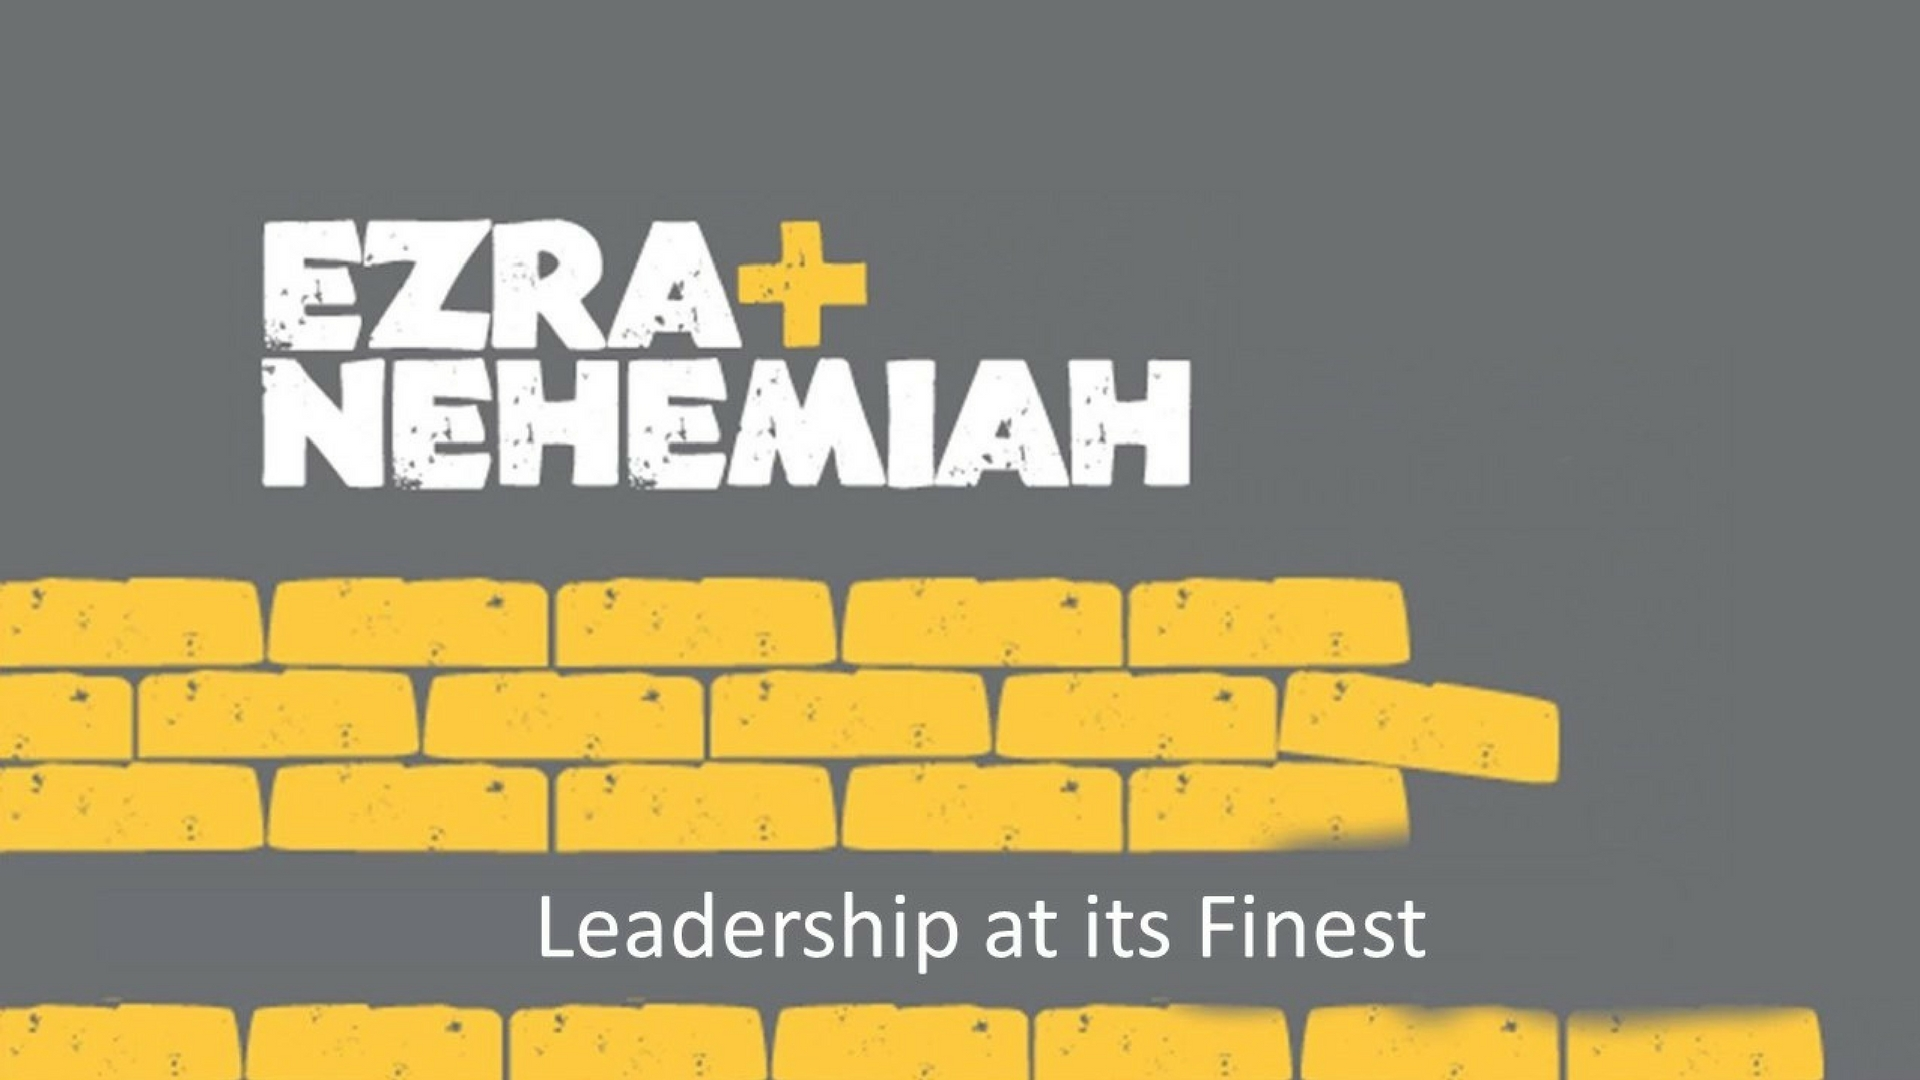 Ezra and Nehemiah.jpg